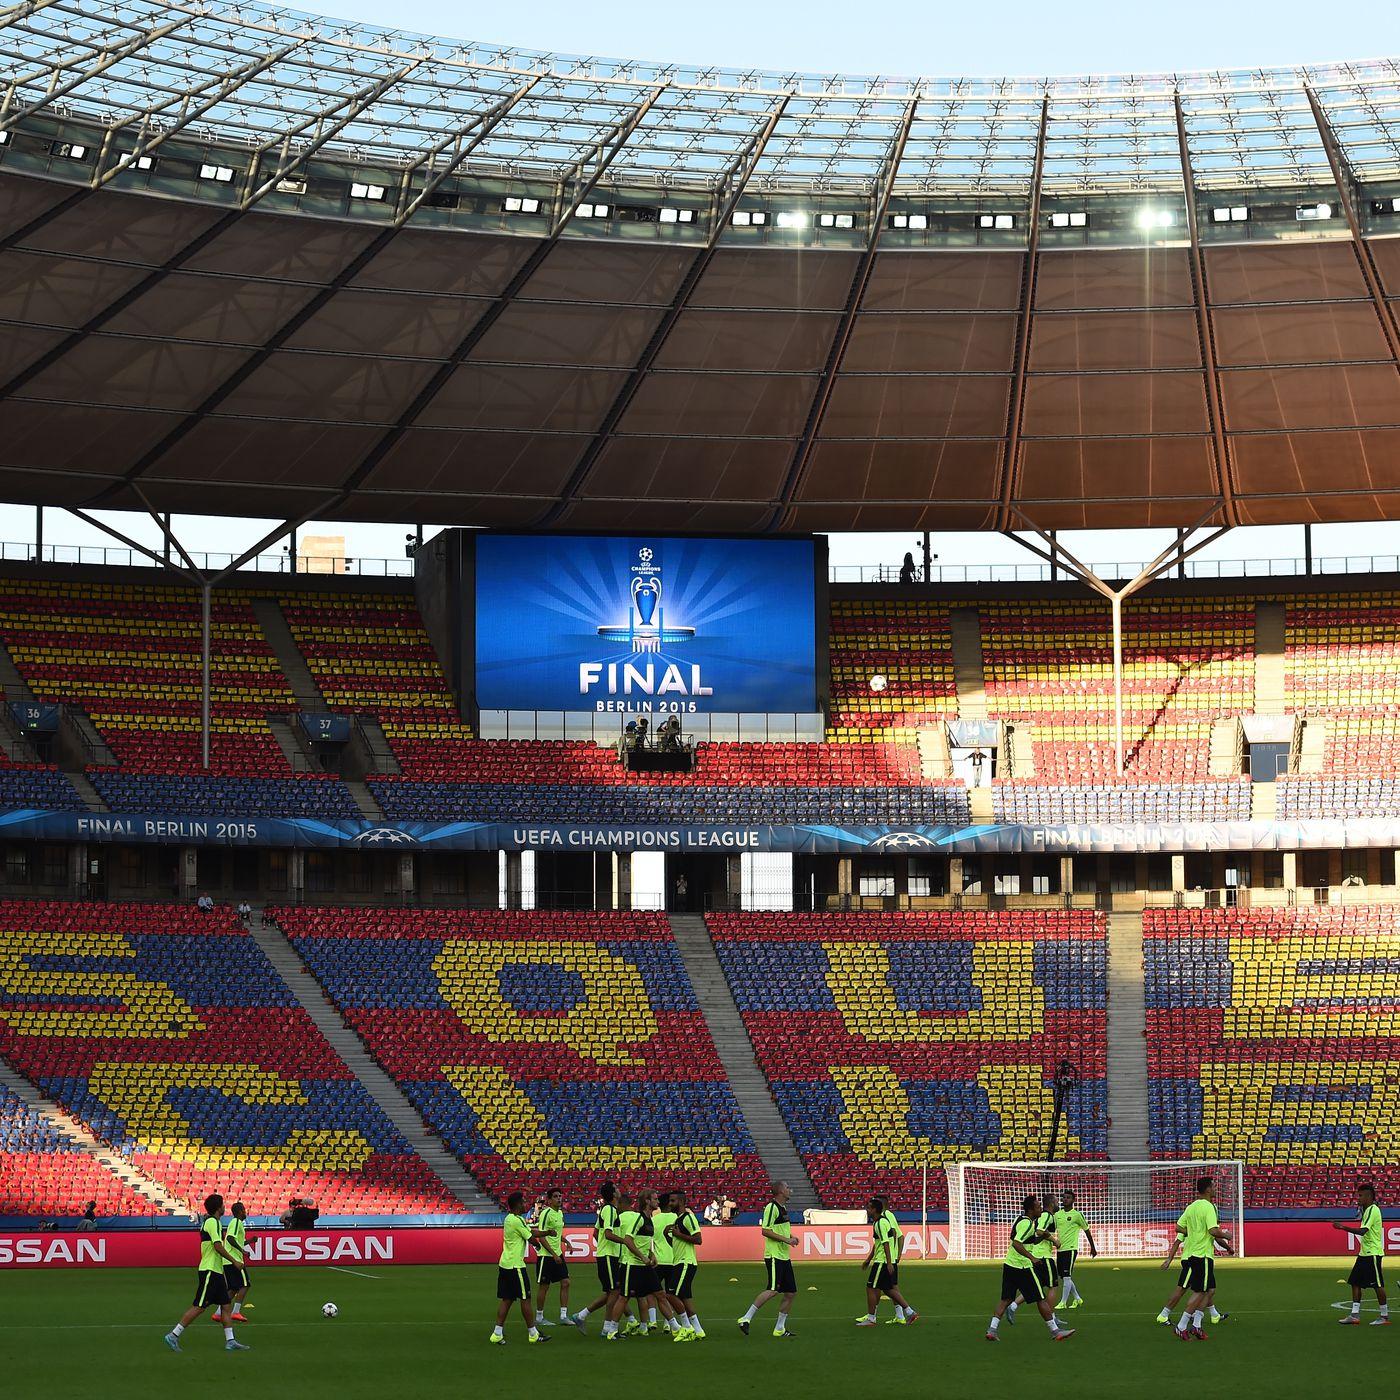 Barcelona Vs Juventus 2015 Champions League Final Projected Lineups Barca Blaugranes